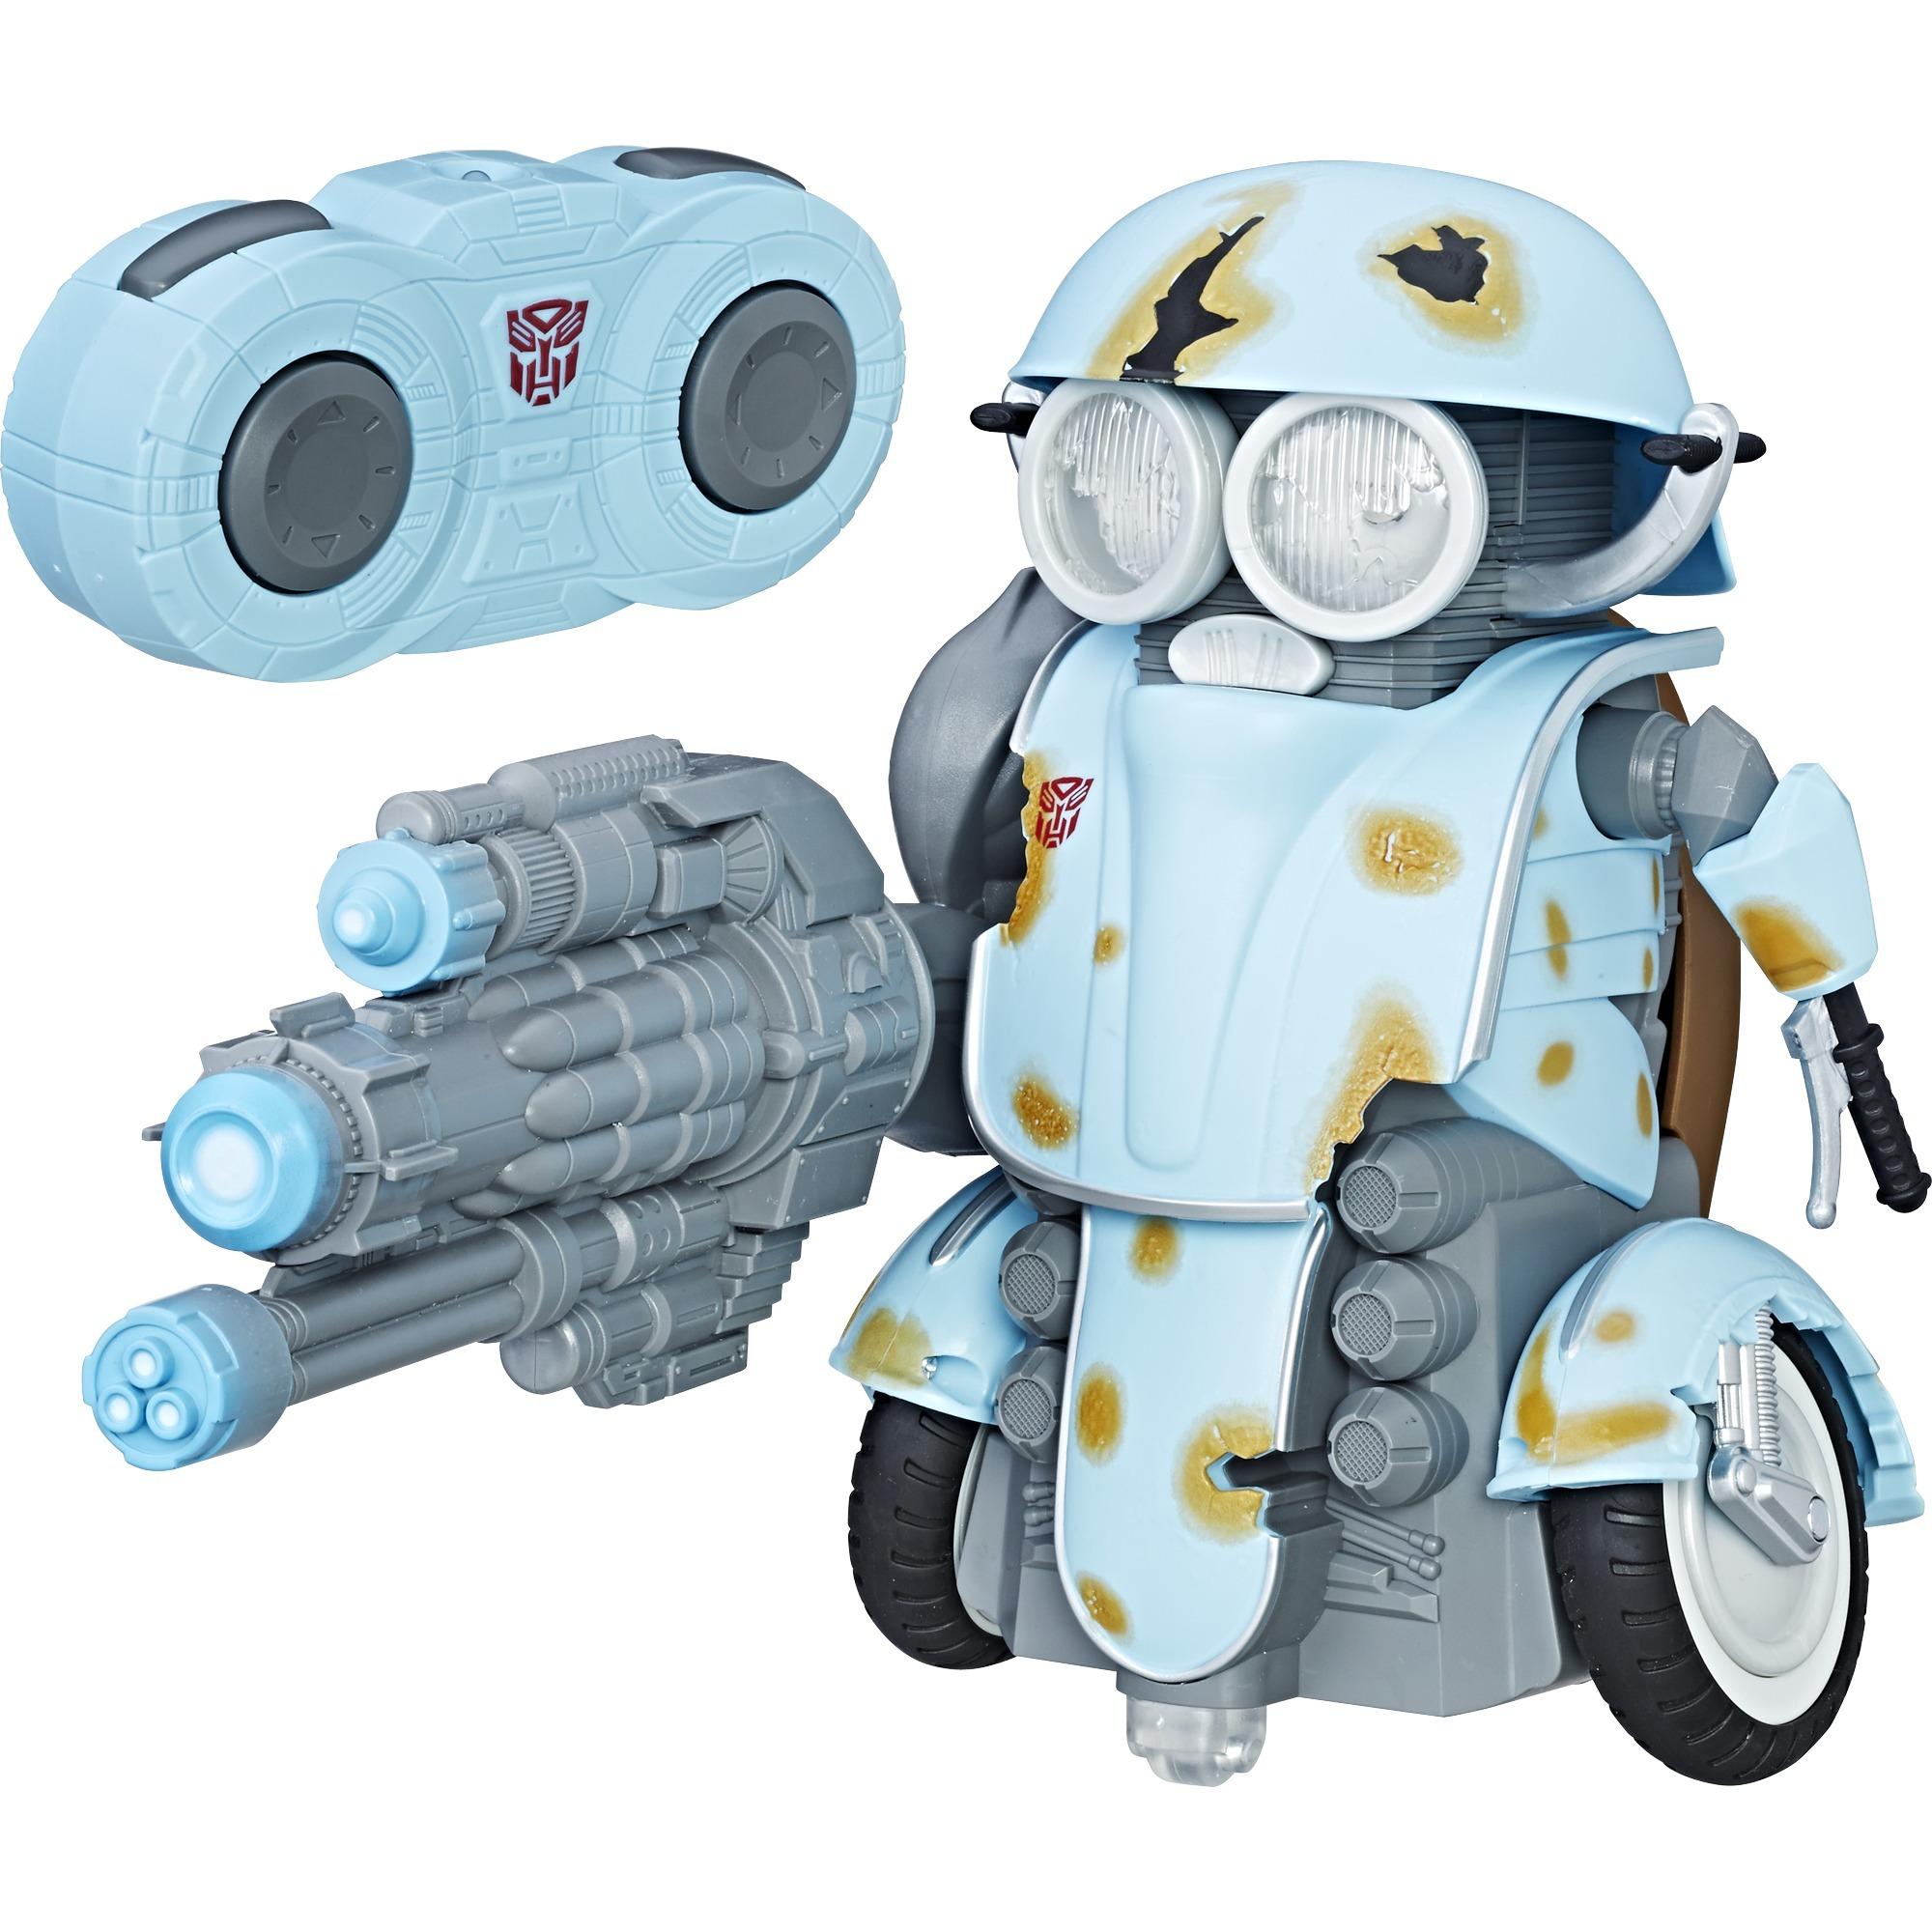 transformer-5-autobot-sqweeks-robot-rc